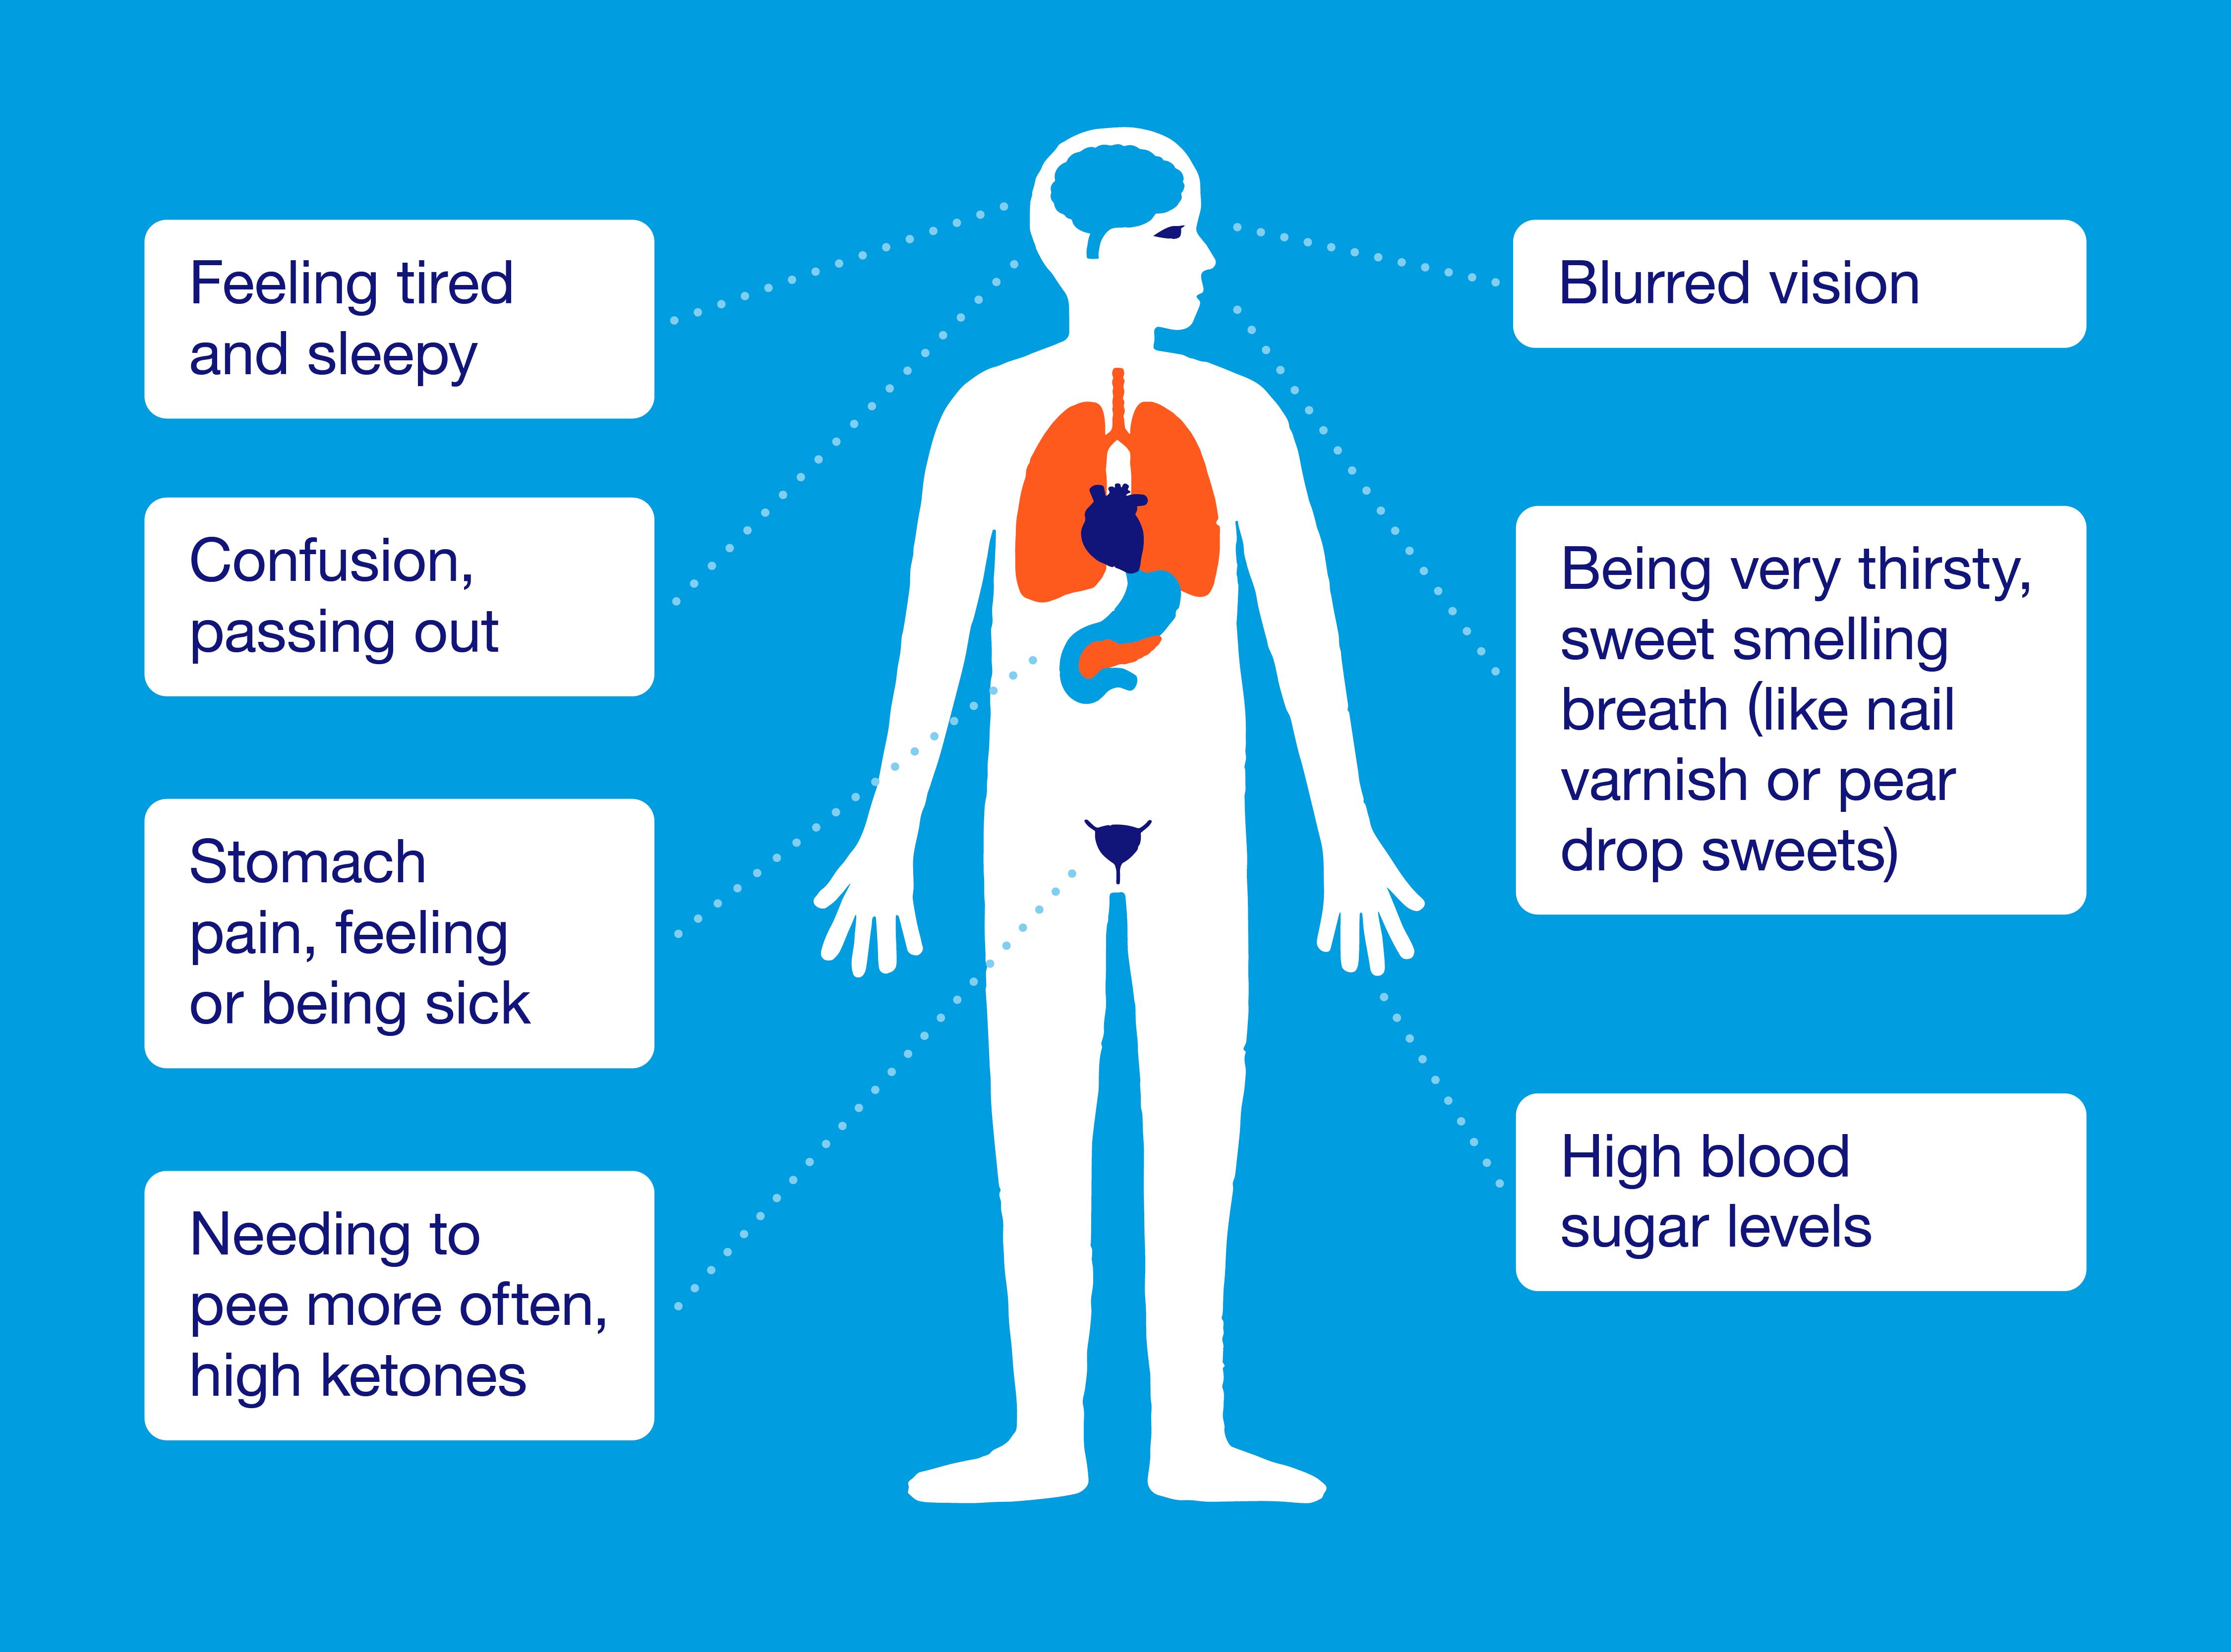 nausea blurred vision fatigue dry mouth keto diet